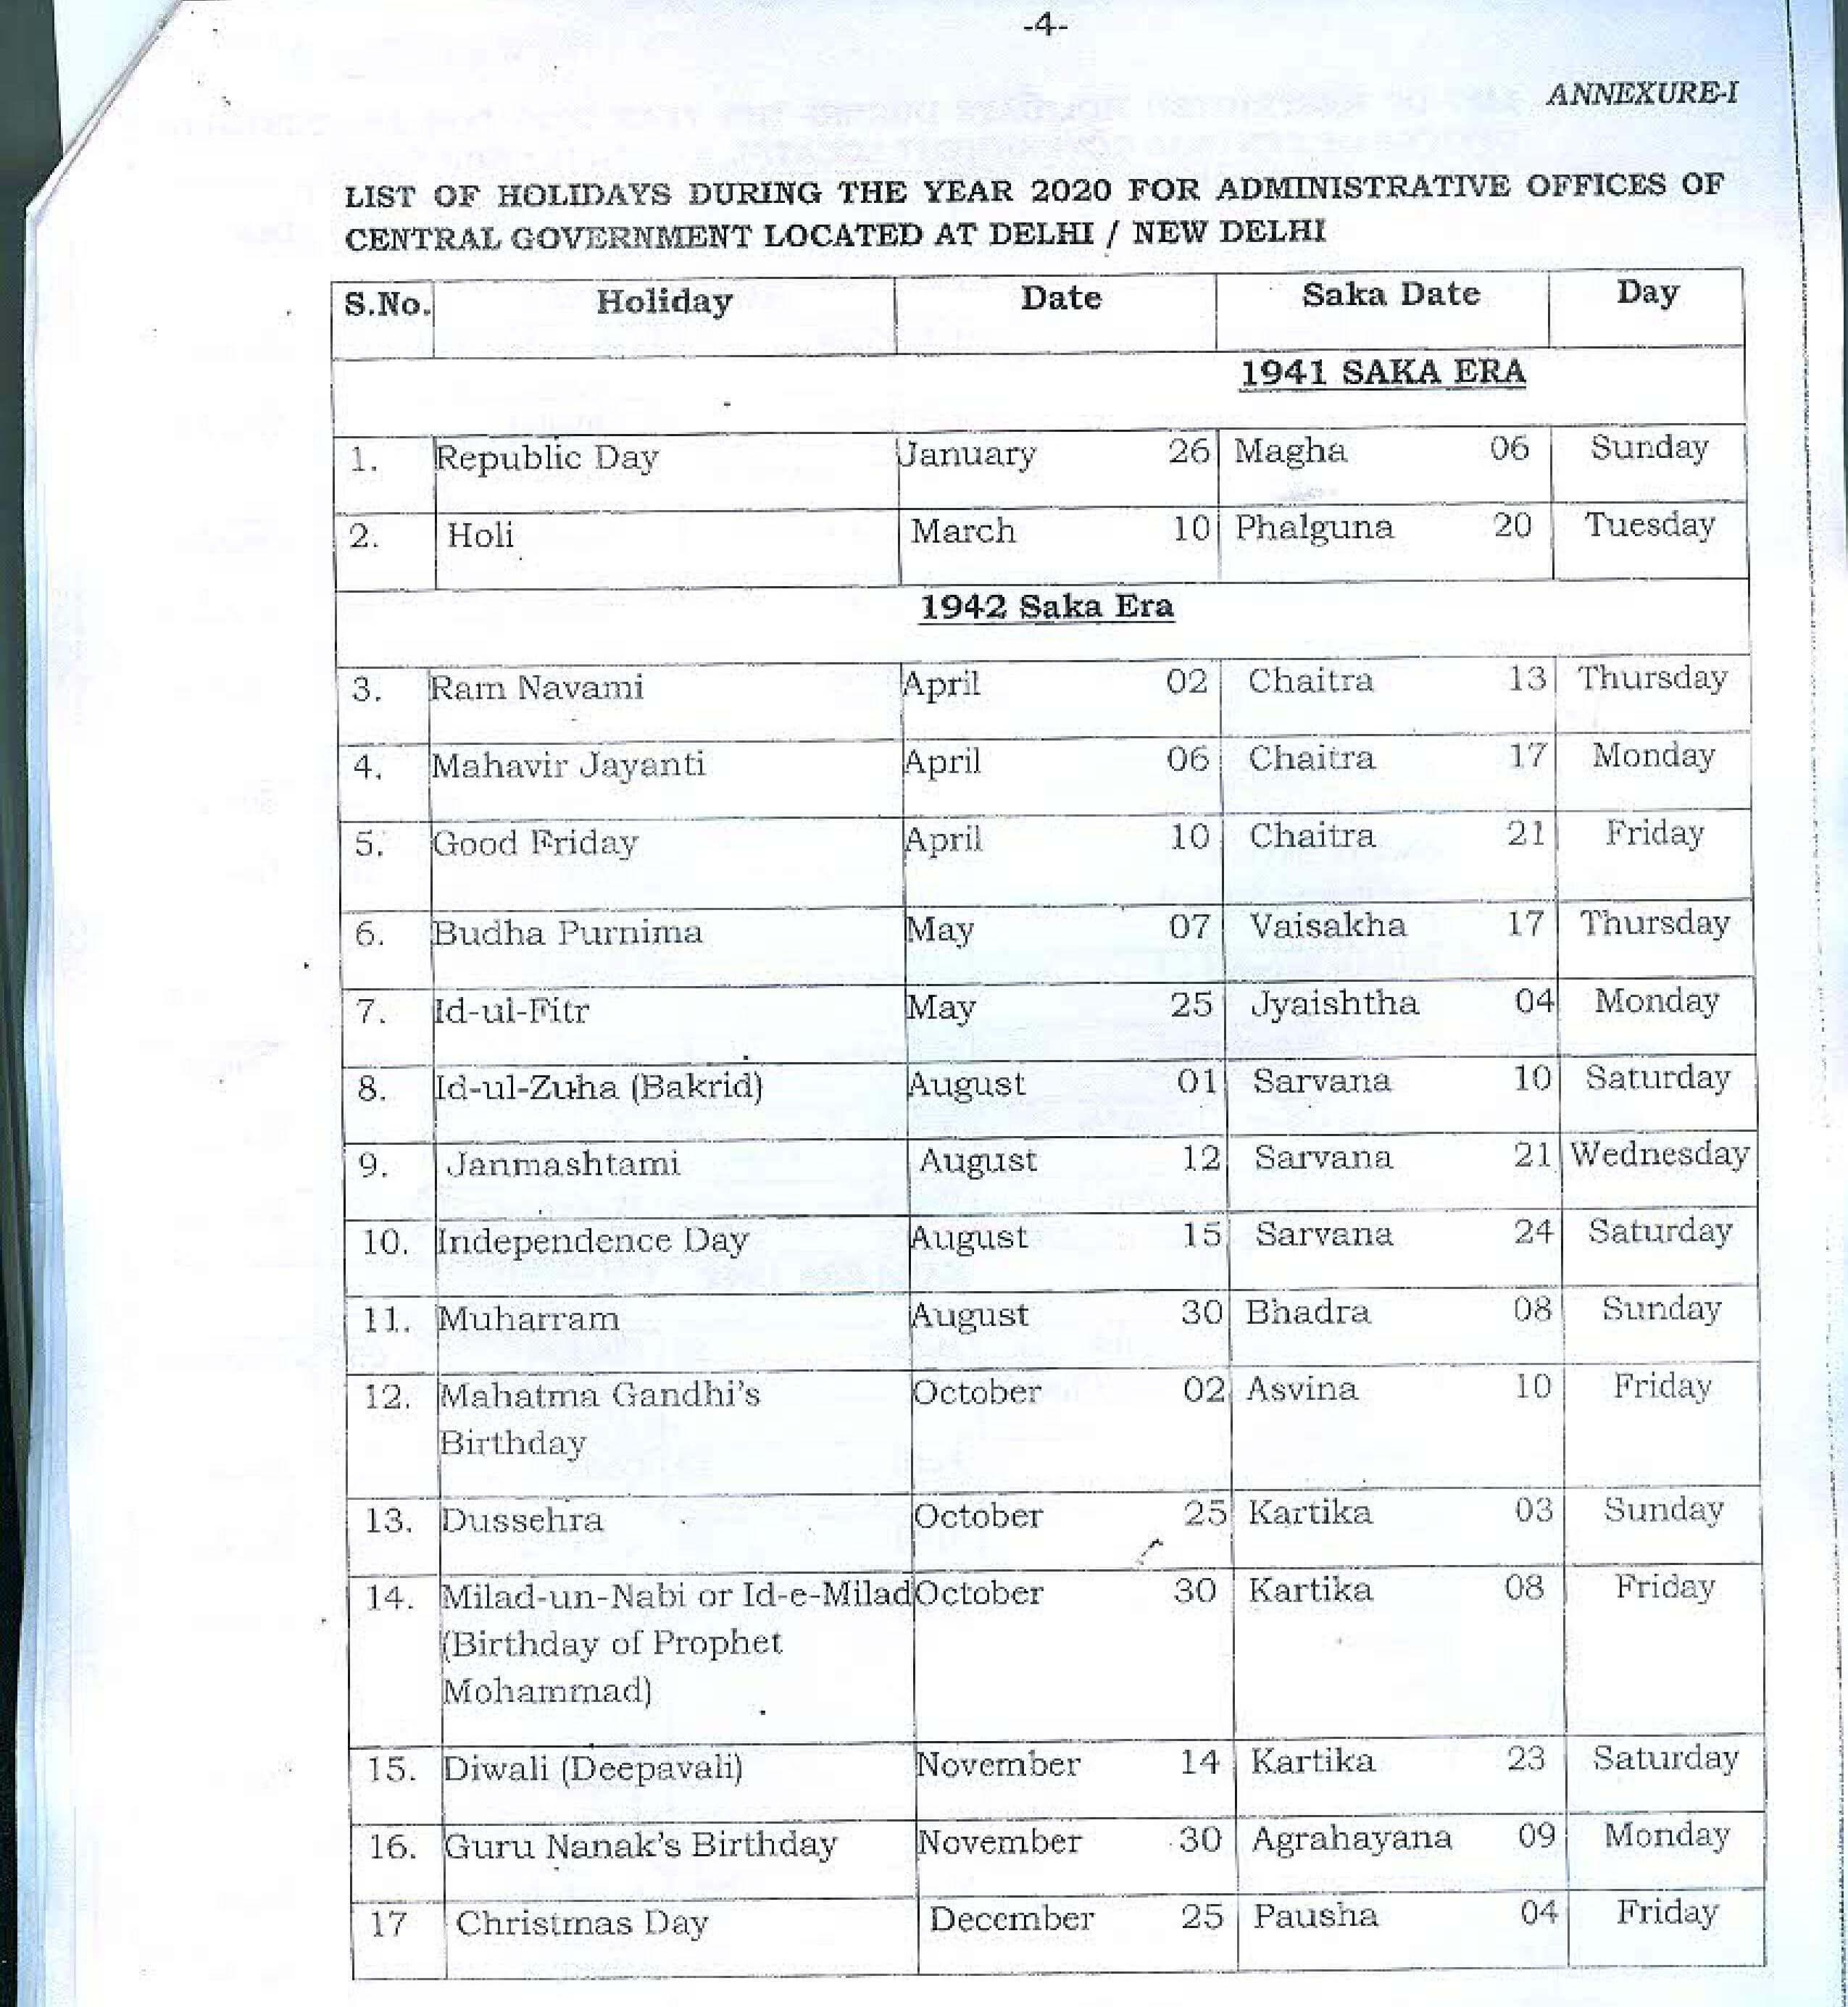 Bsnl Holidays List 2020   Gazetted And Restricted Holidays regarding Bihar Govt Calendar 2020